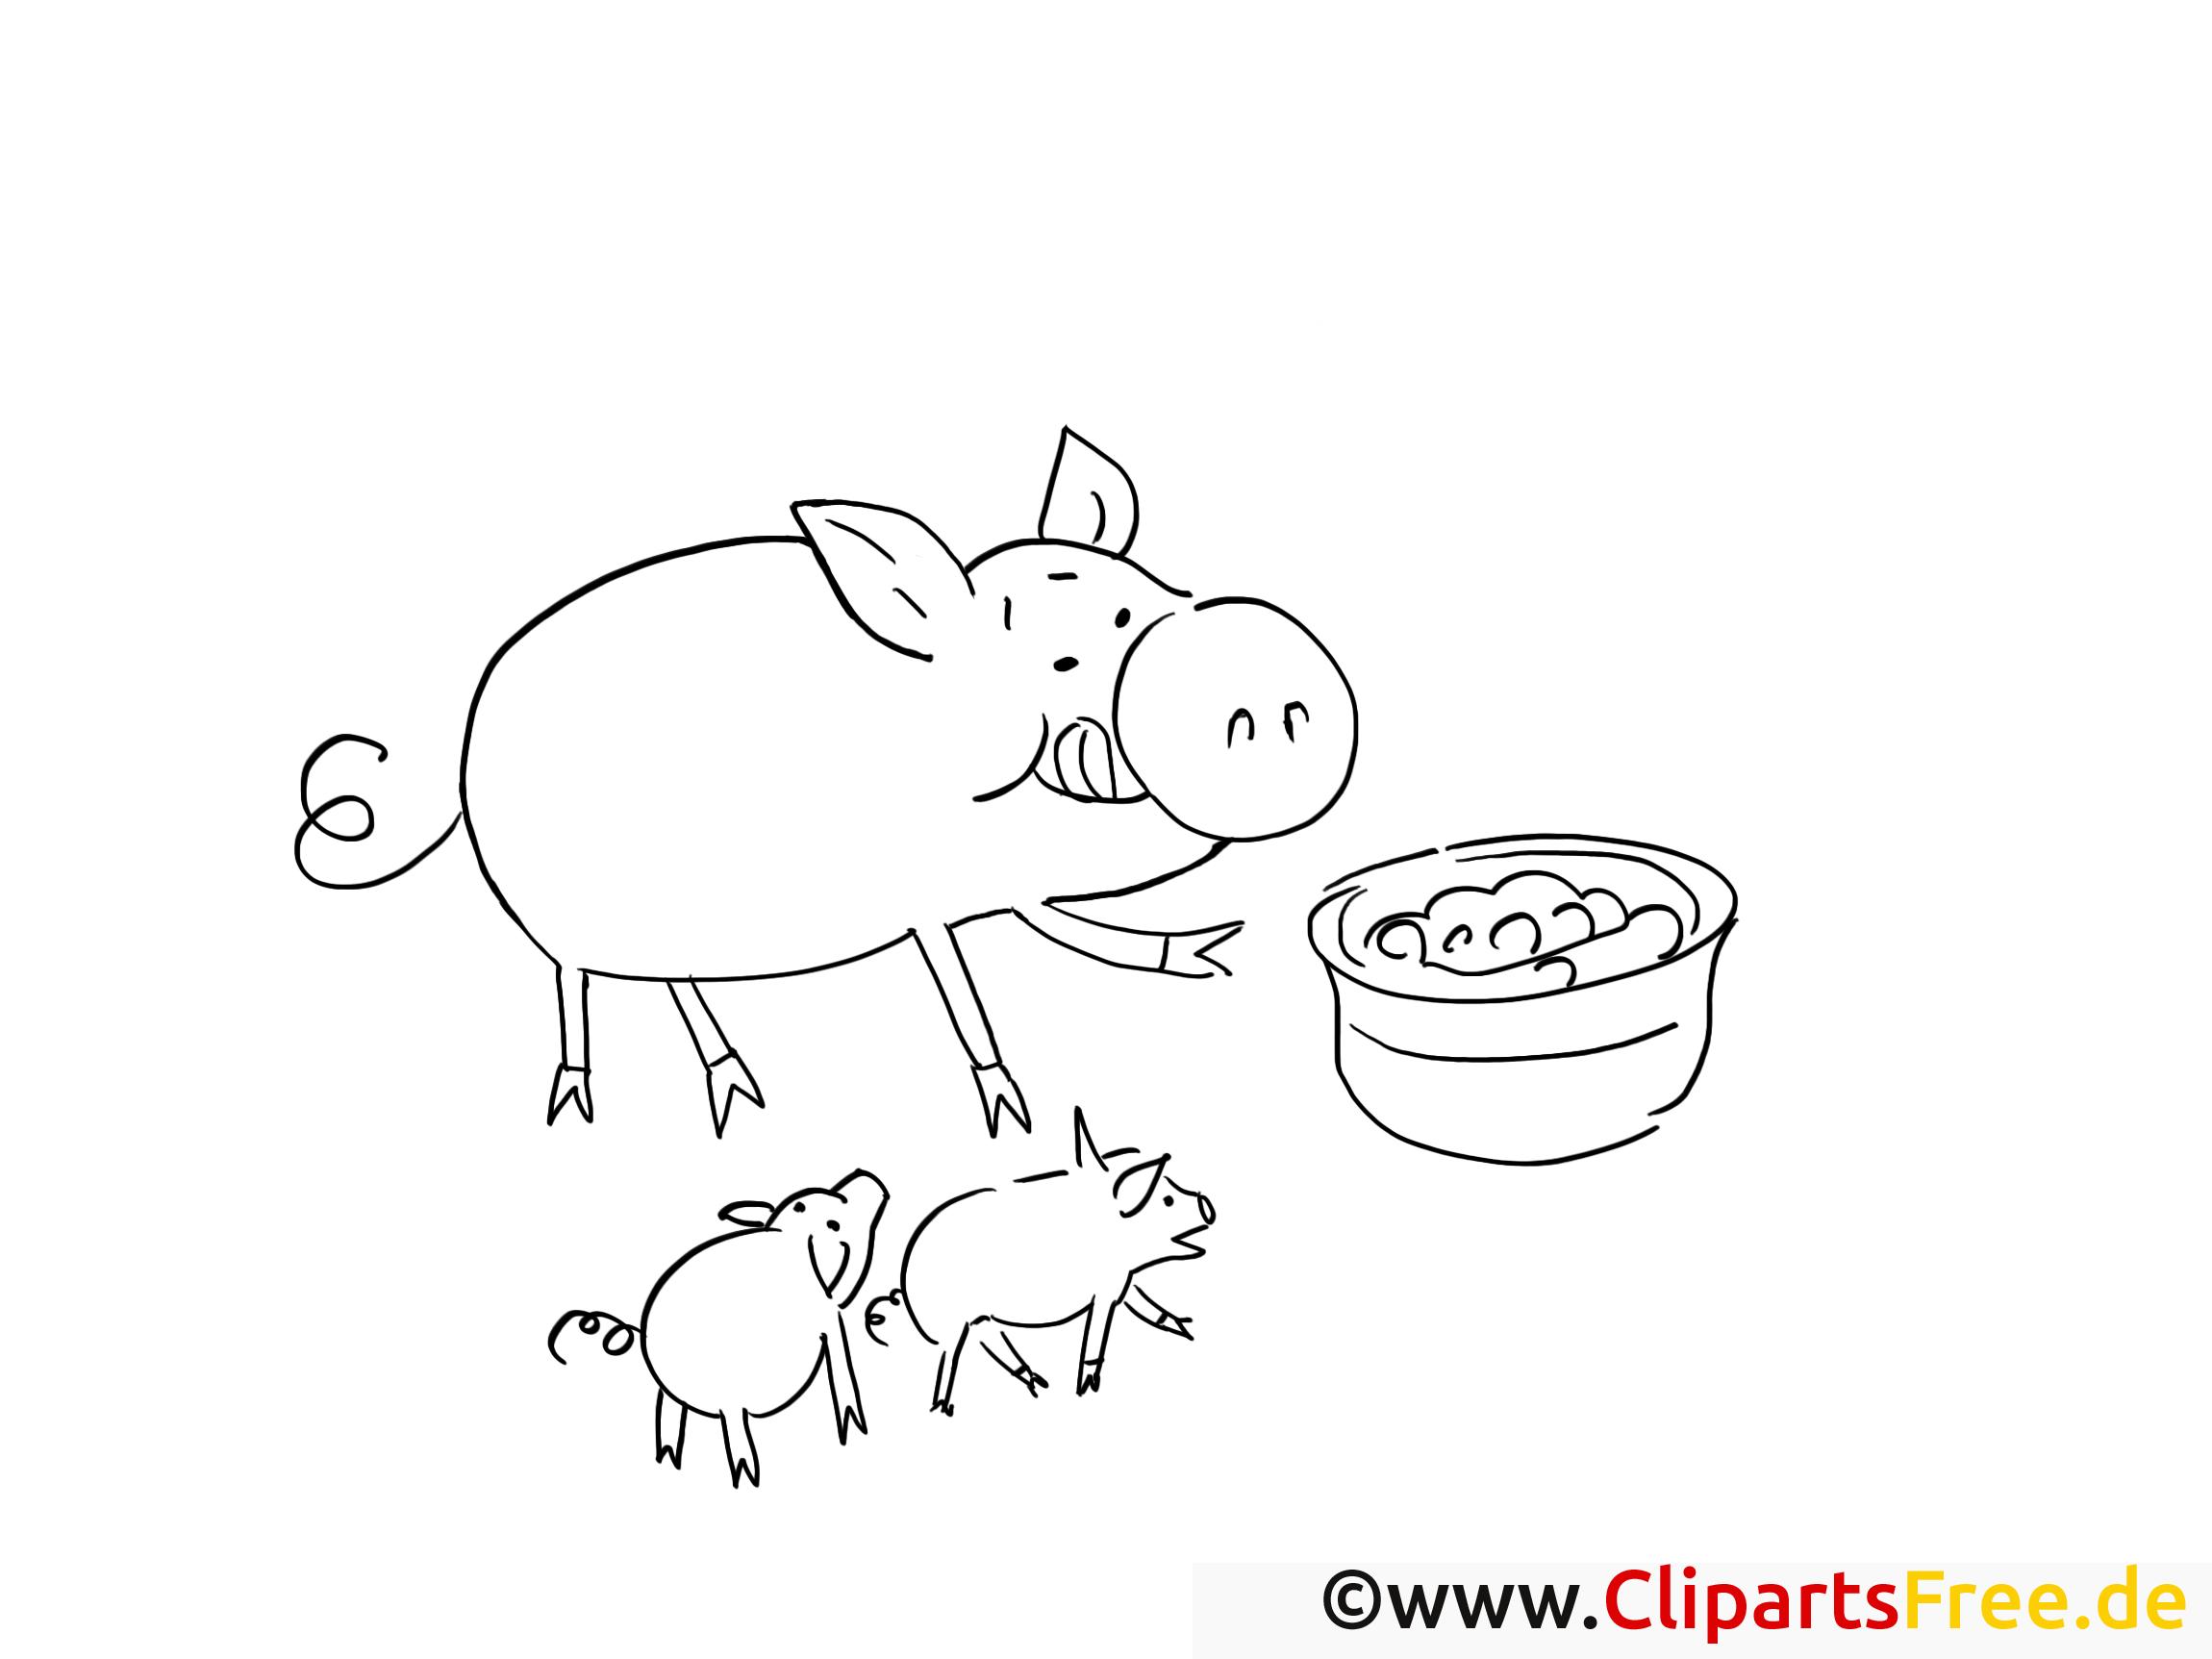 Cochon illustration – Campagne à imprimer